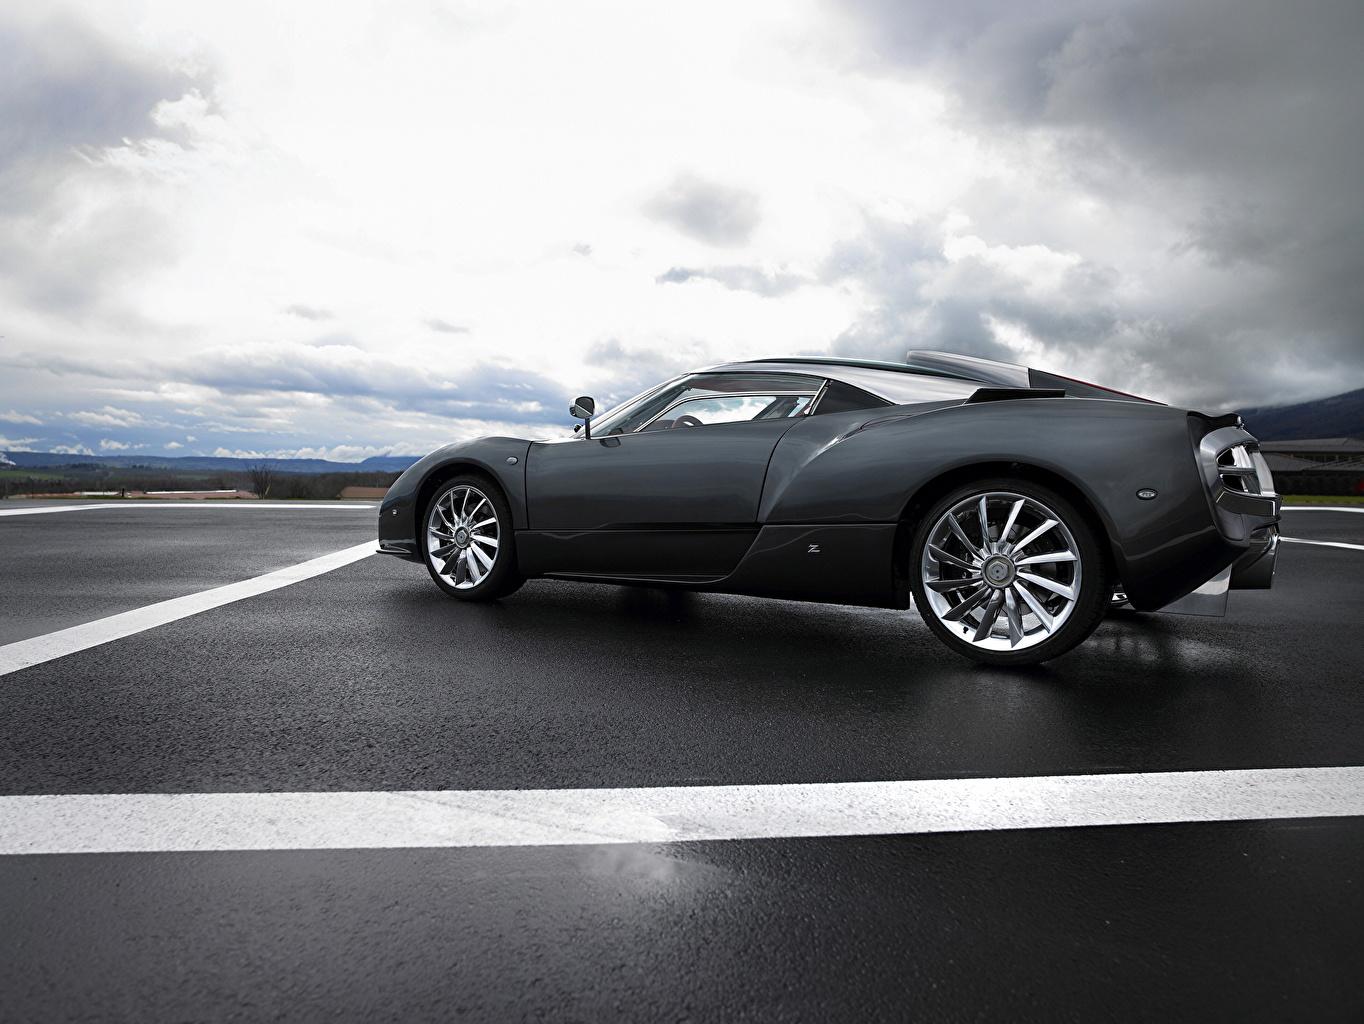 Photo Spyker 2008 C12 Zagato luxurious Side Cars Asphalt Luxury expensive auto automobile